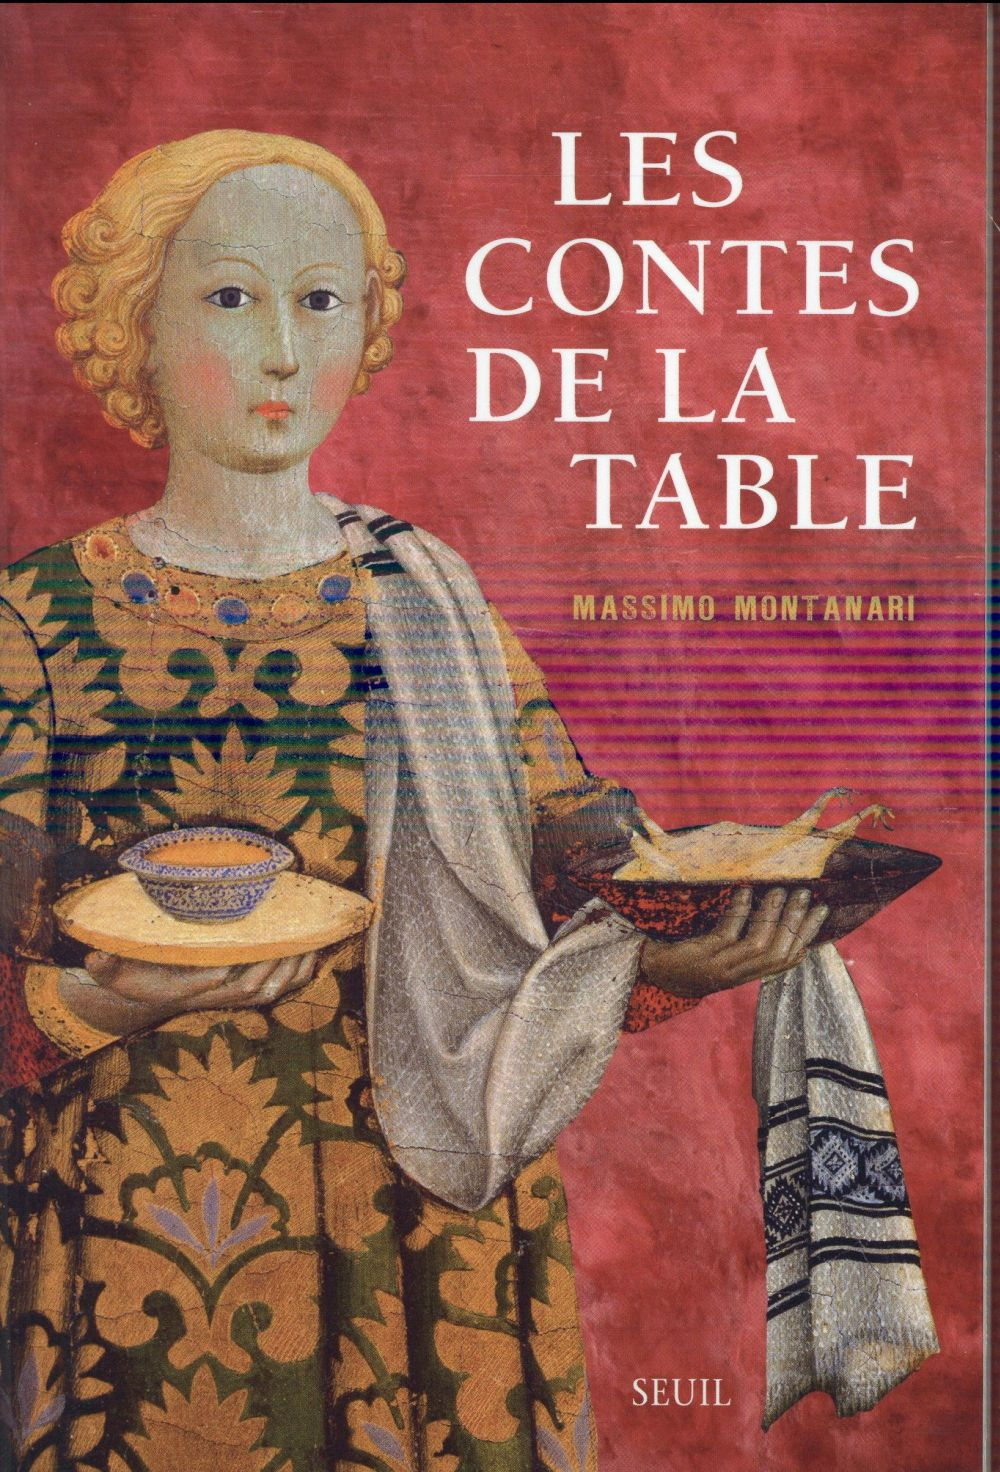 Les contes de la table - Massimo Montanari - Librairie Ombres Blanches